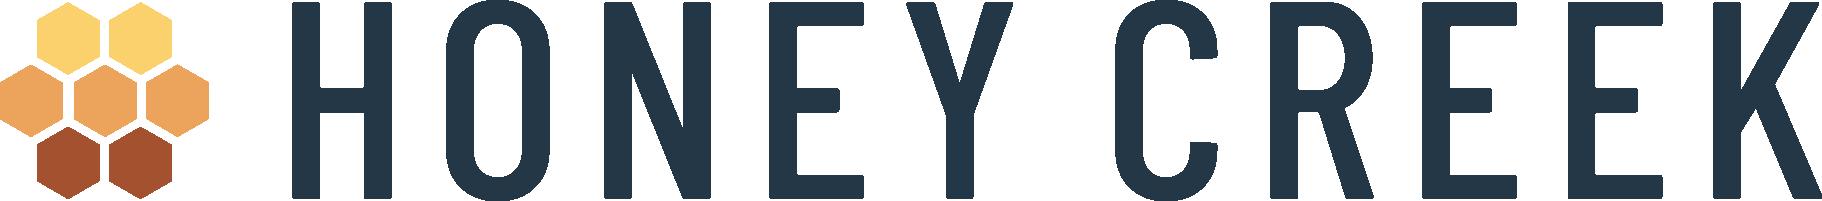 Honey Creek Logo logo